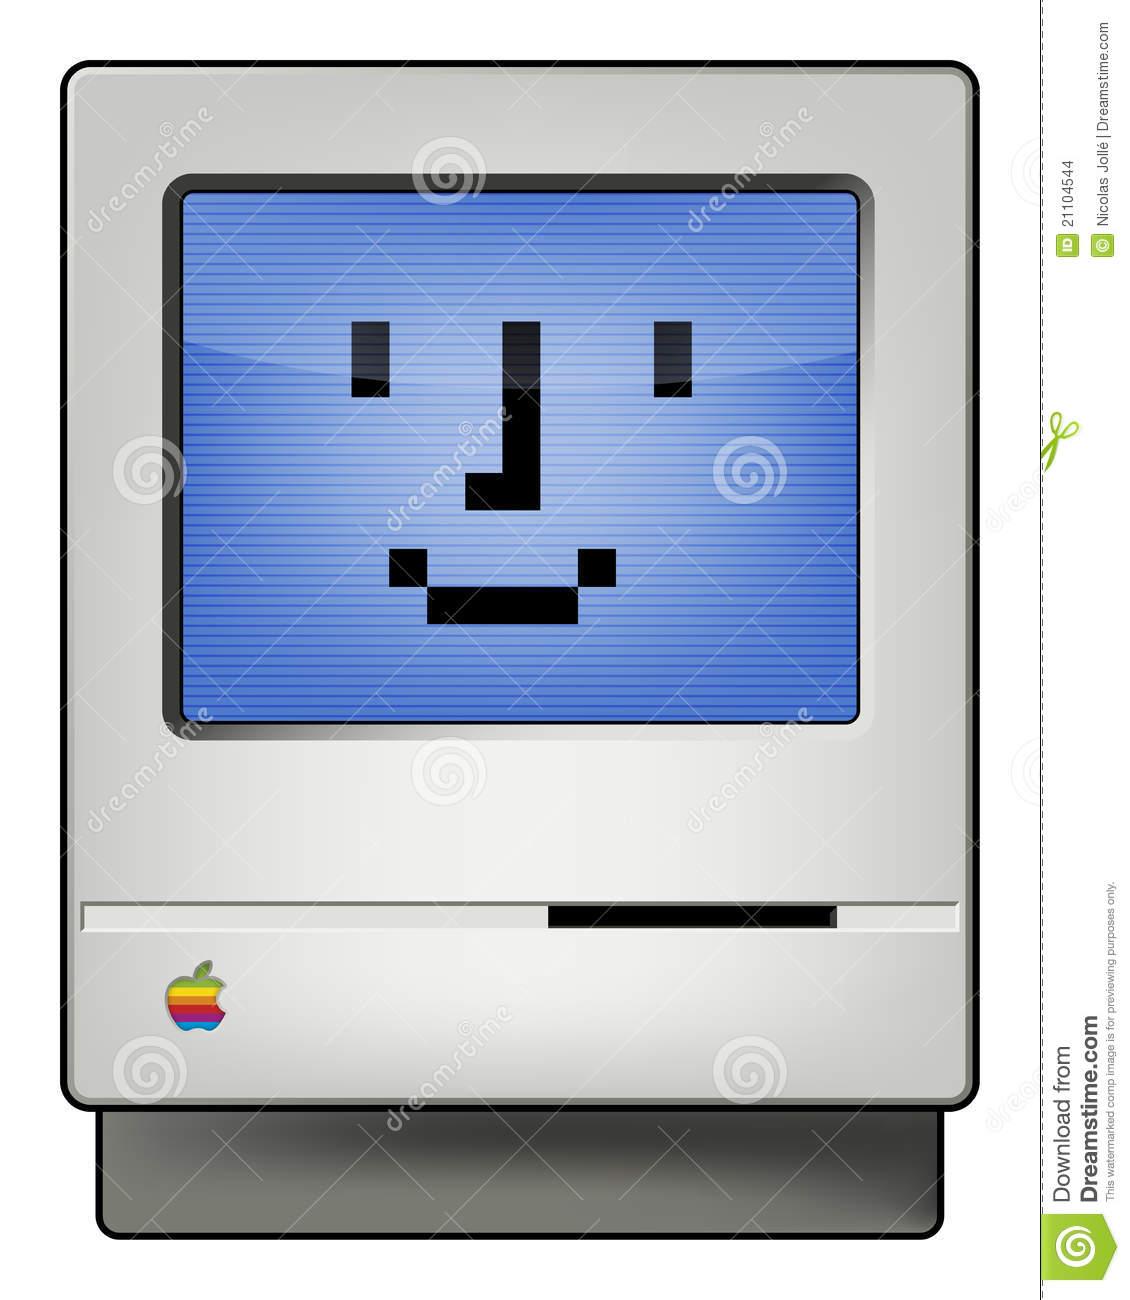 Mac Computer Clip Art Clipart Panda Free-Mac Computer Clip Art Clipart Panda Free Clipart Images-11